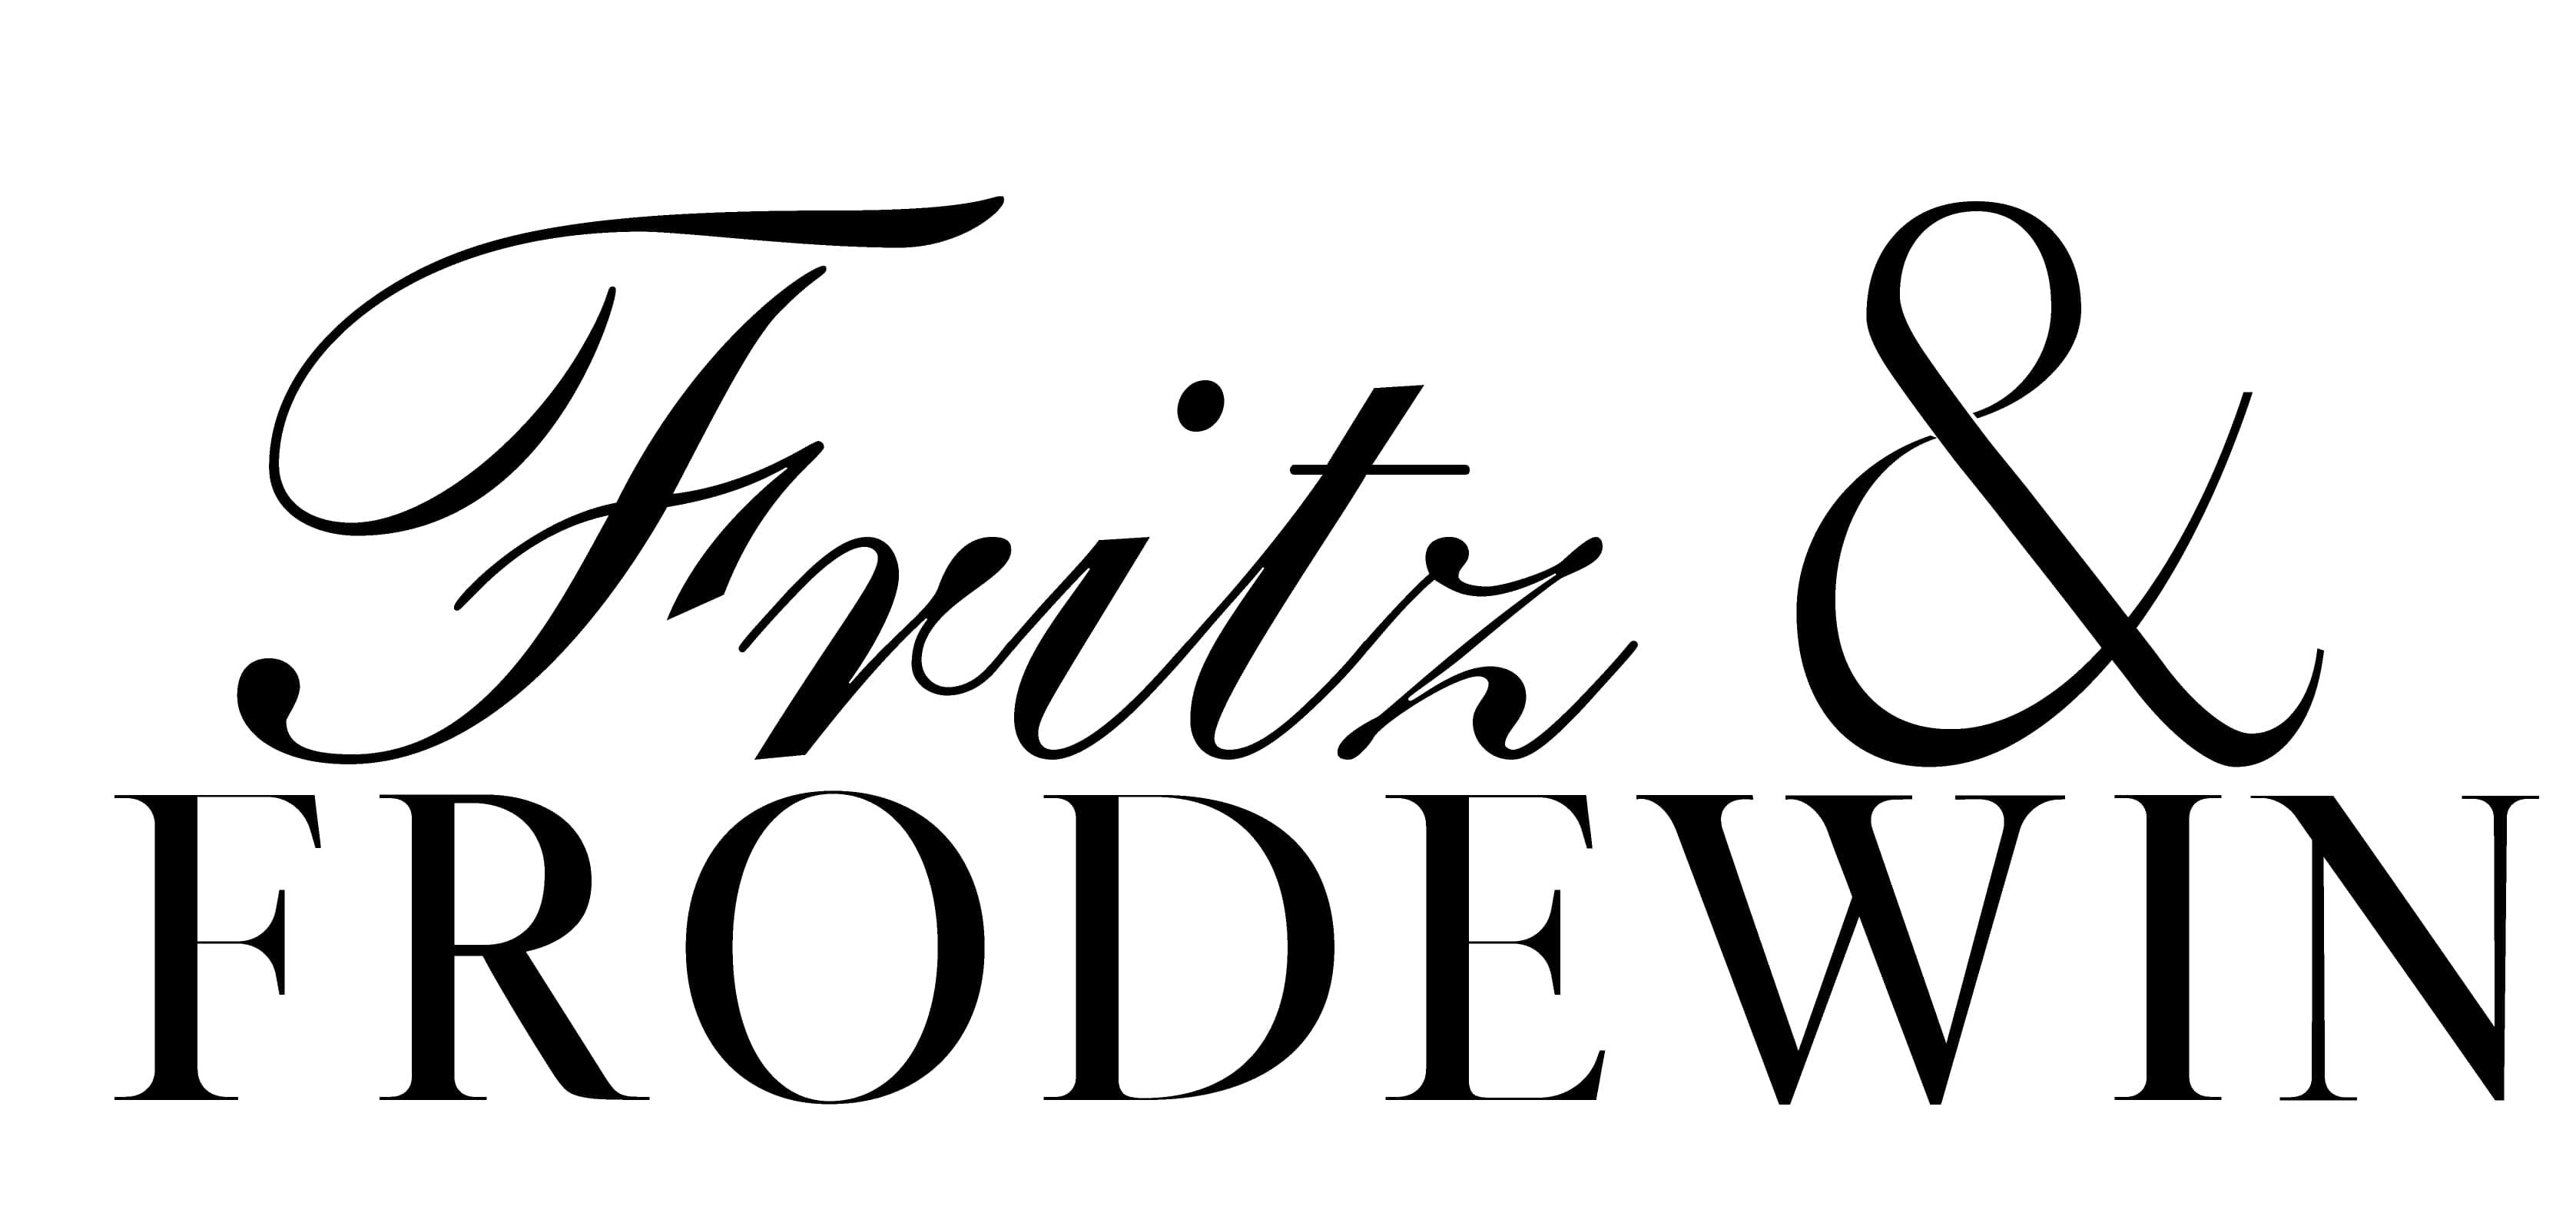 Fritz & Frodewin